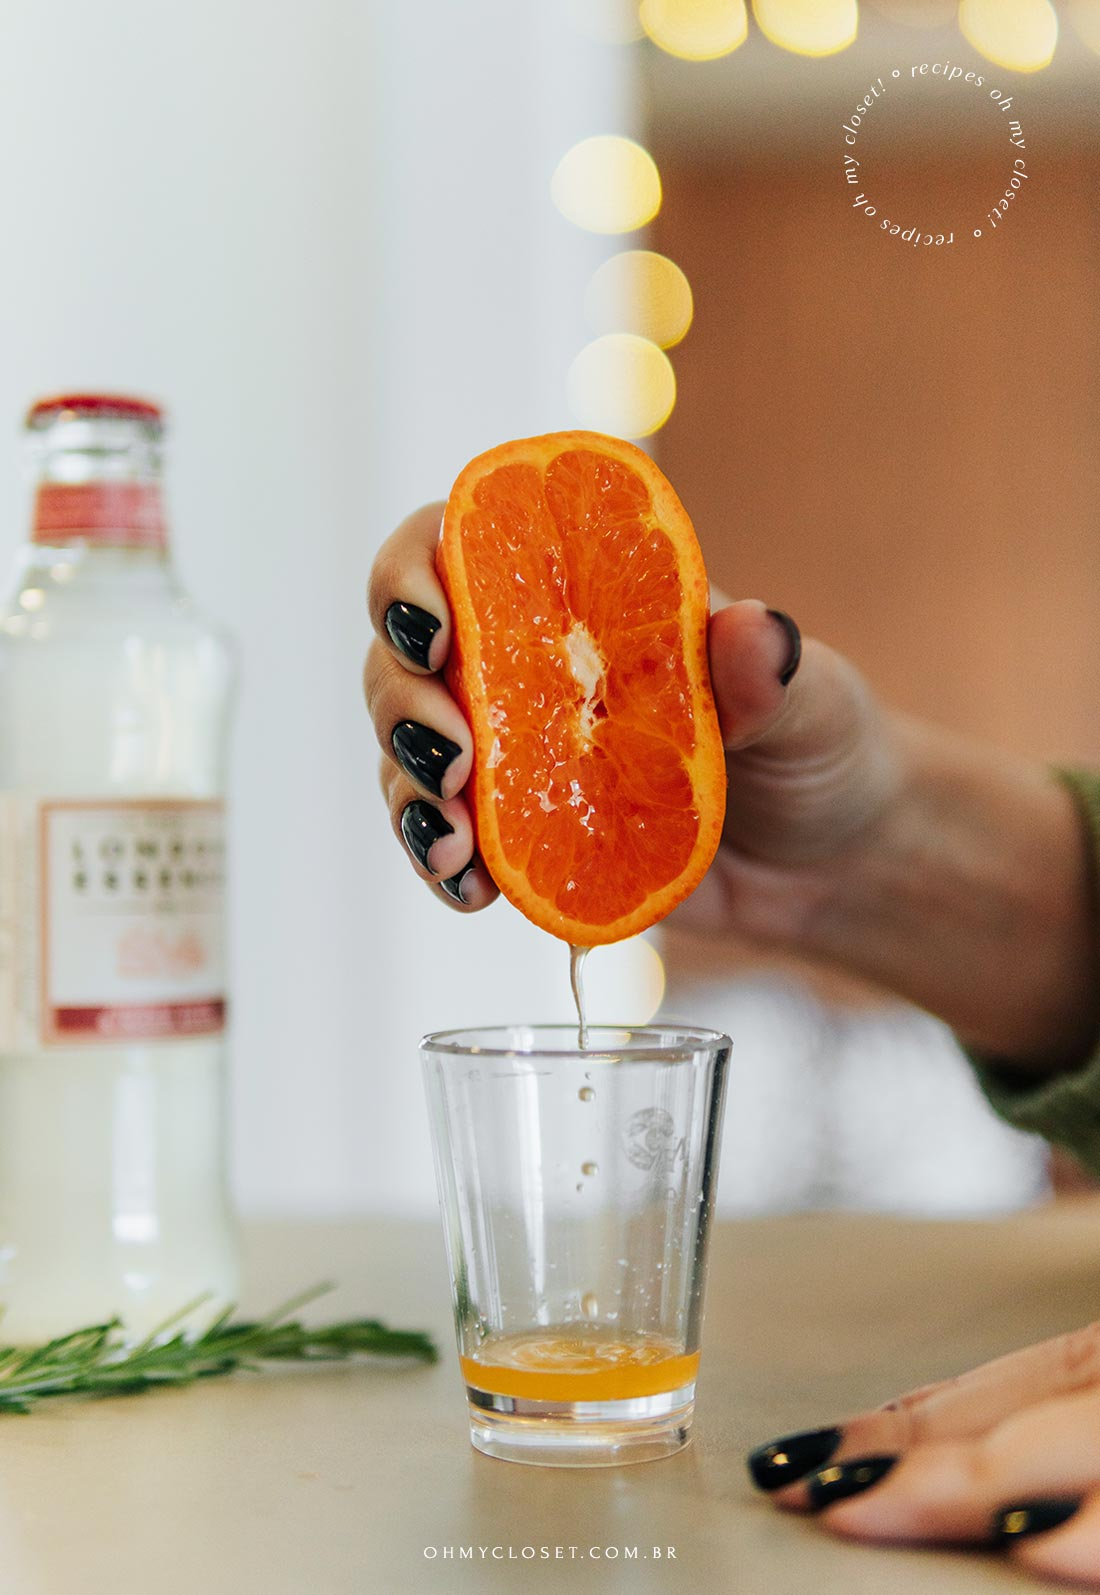 Preparando o drink, espremendo a tangerina.